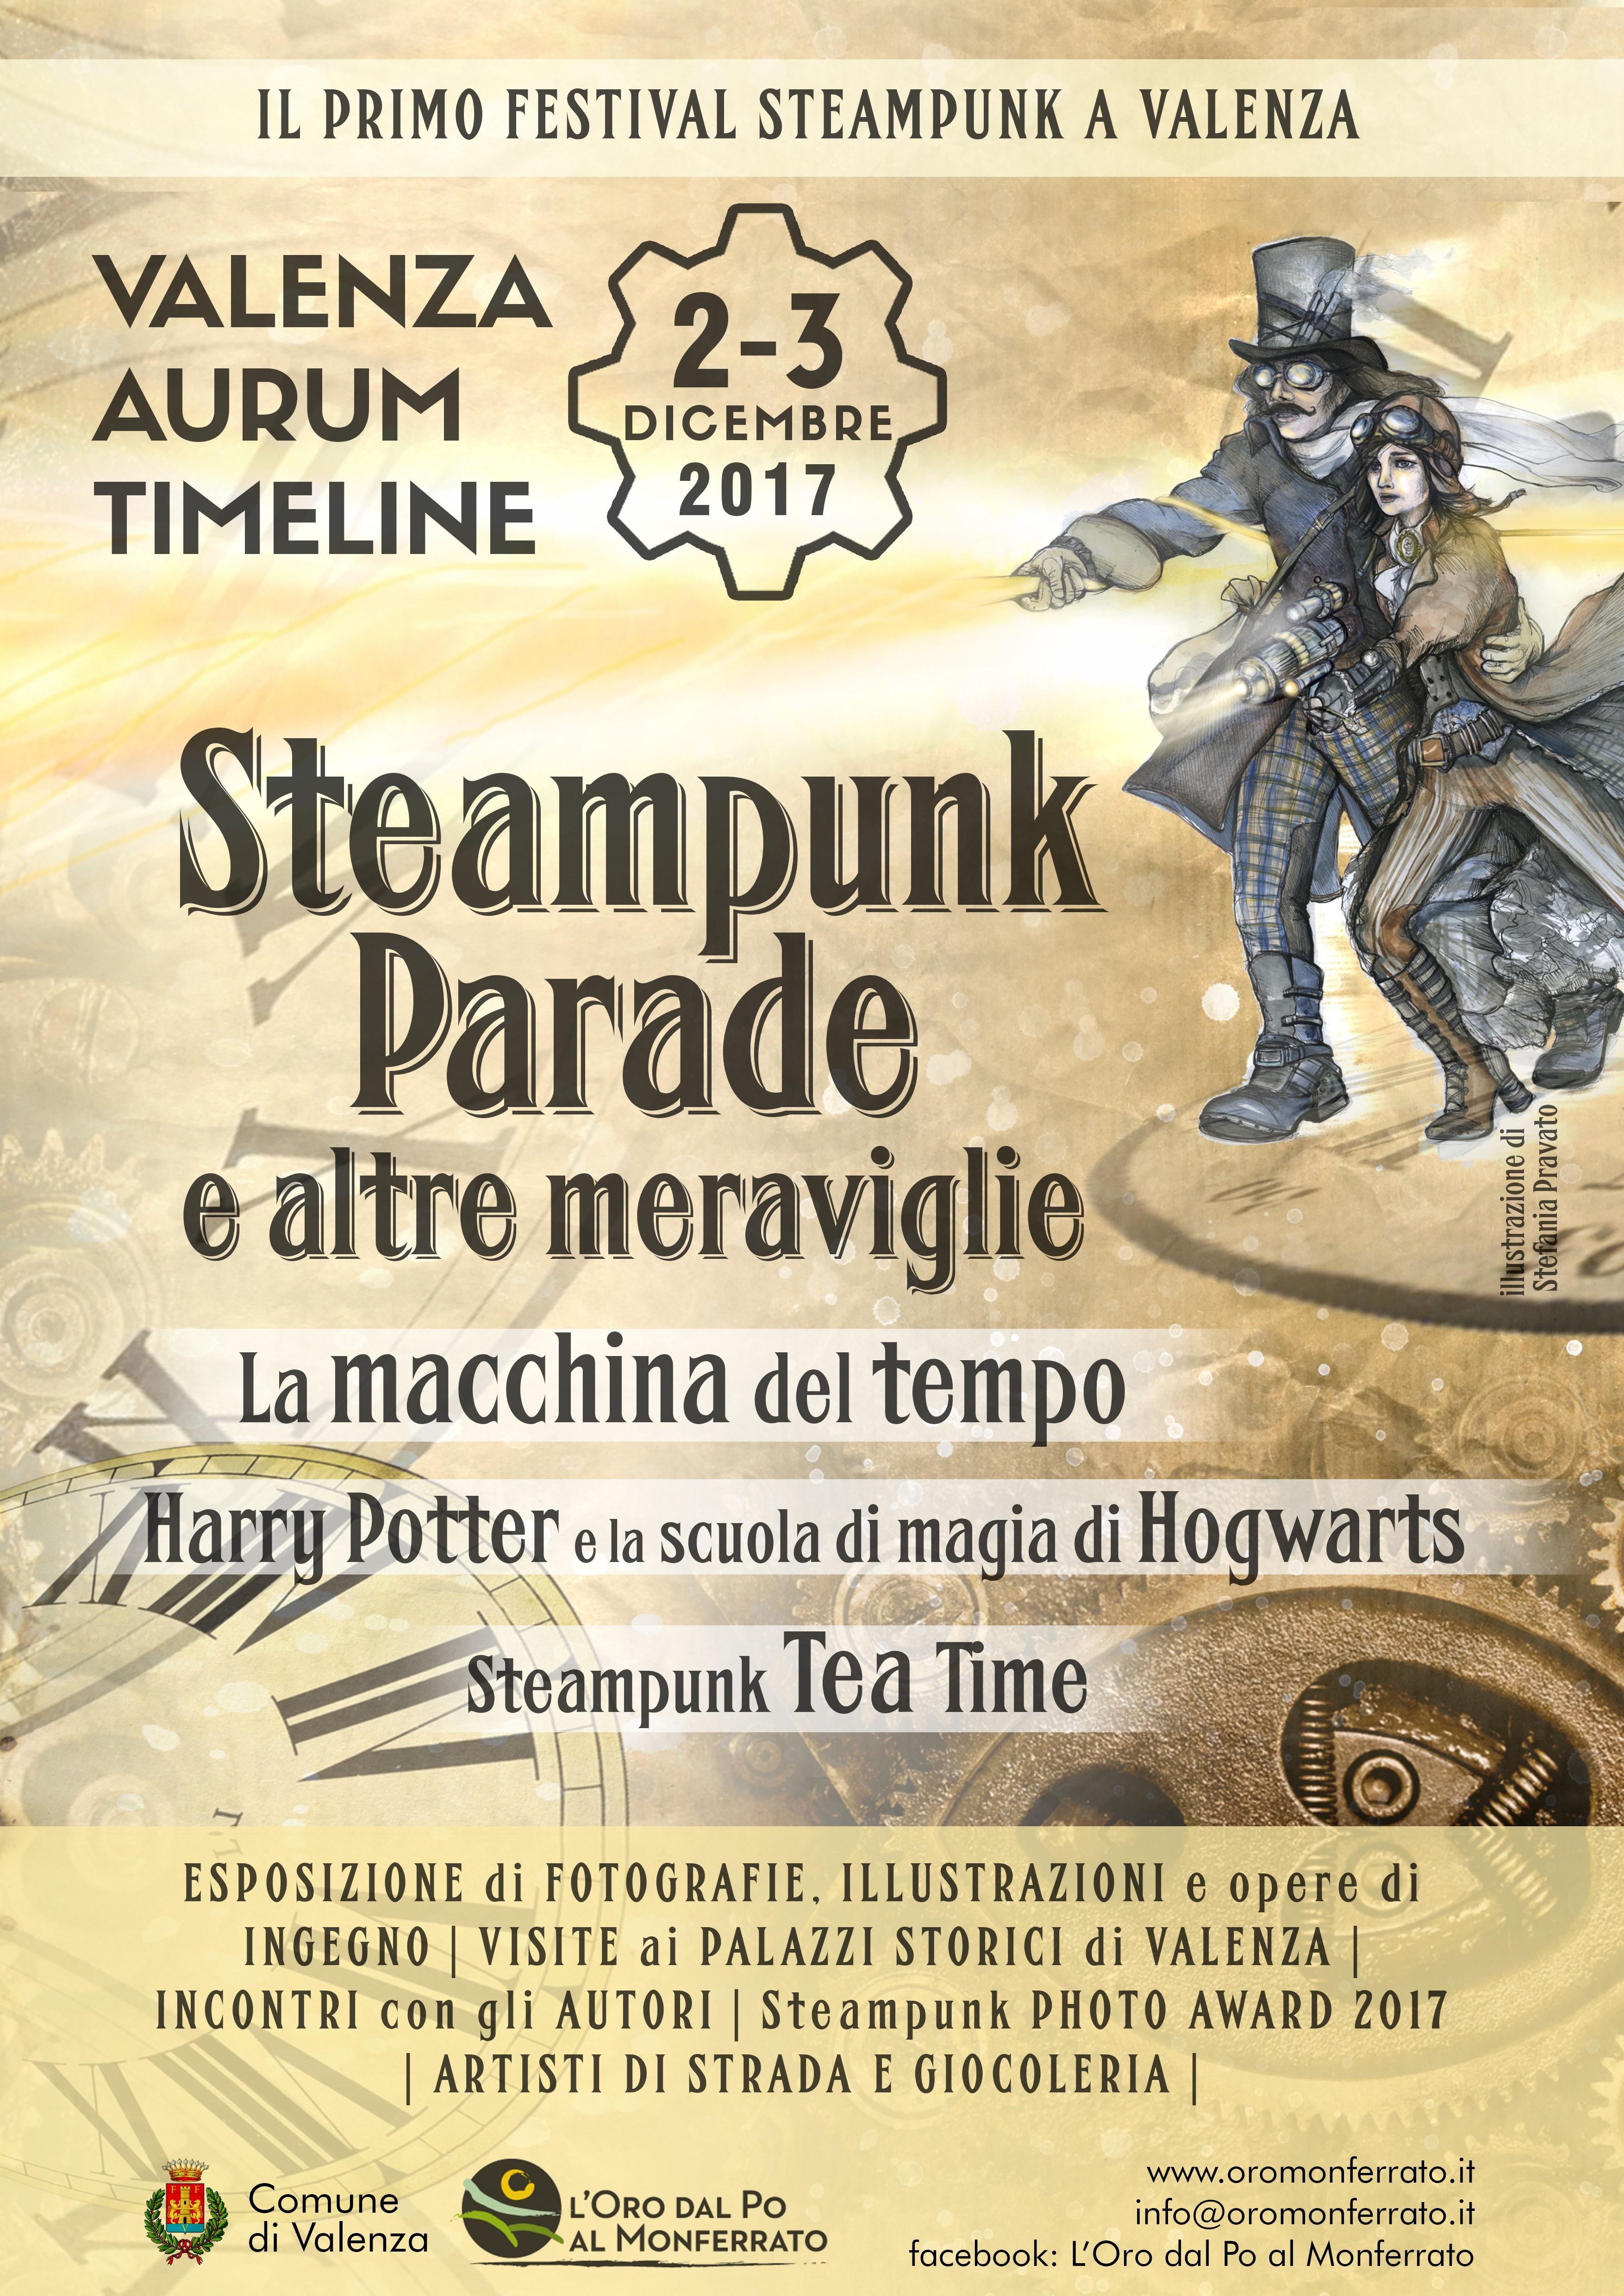 Steampunk incontri